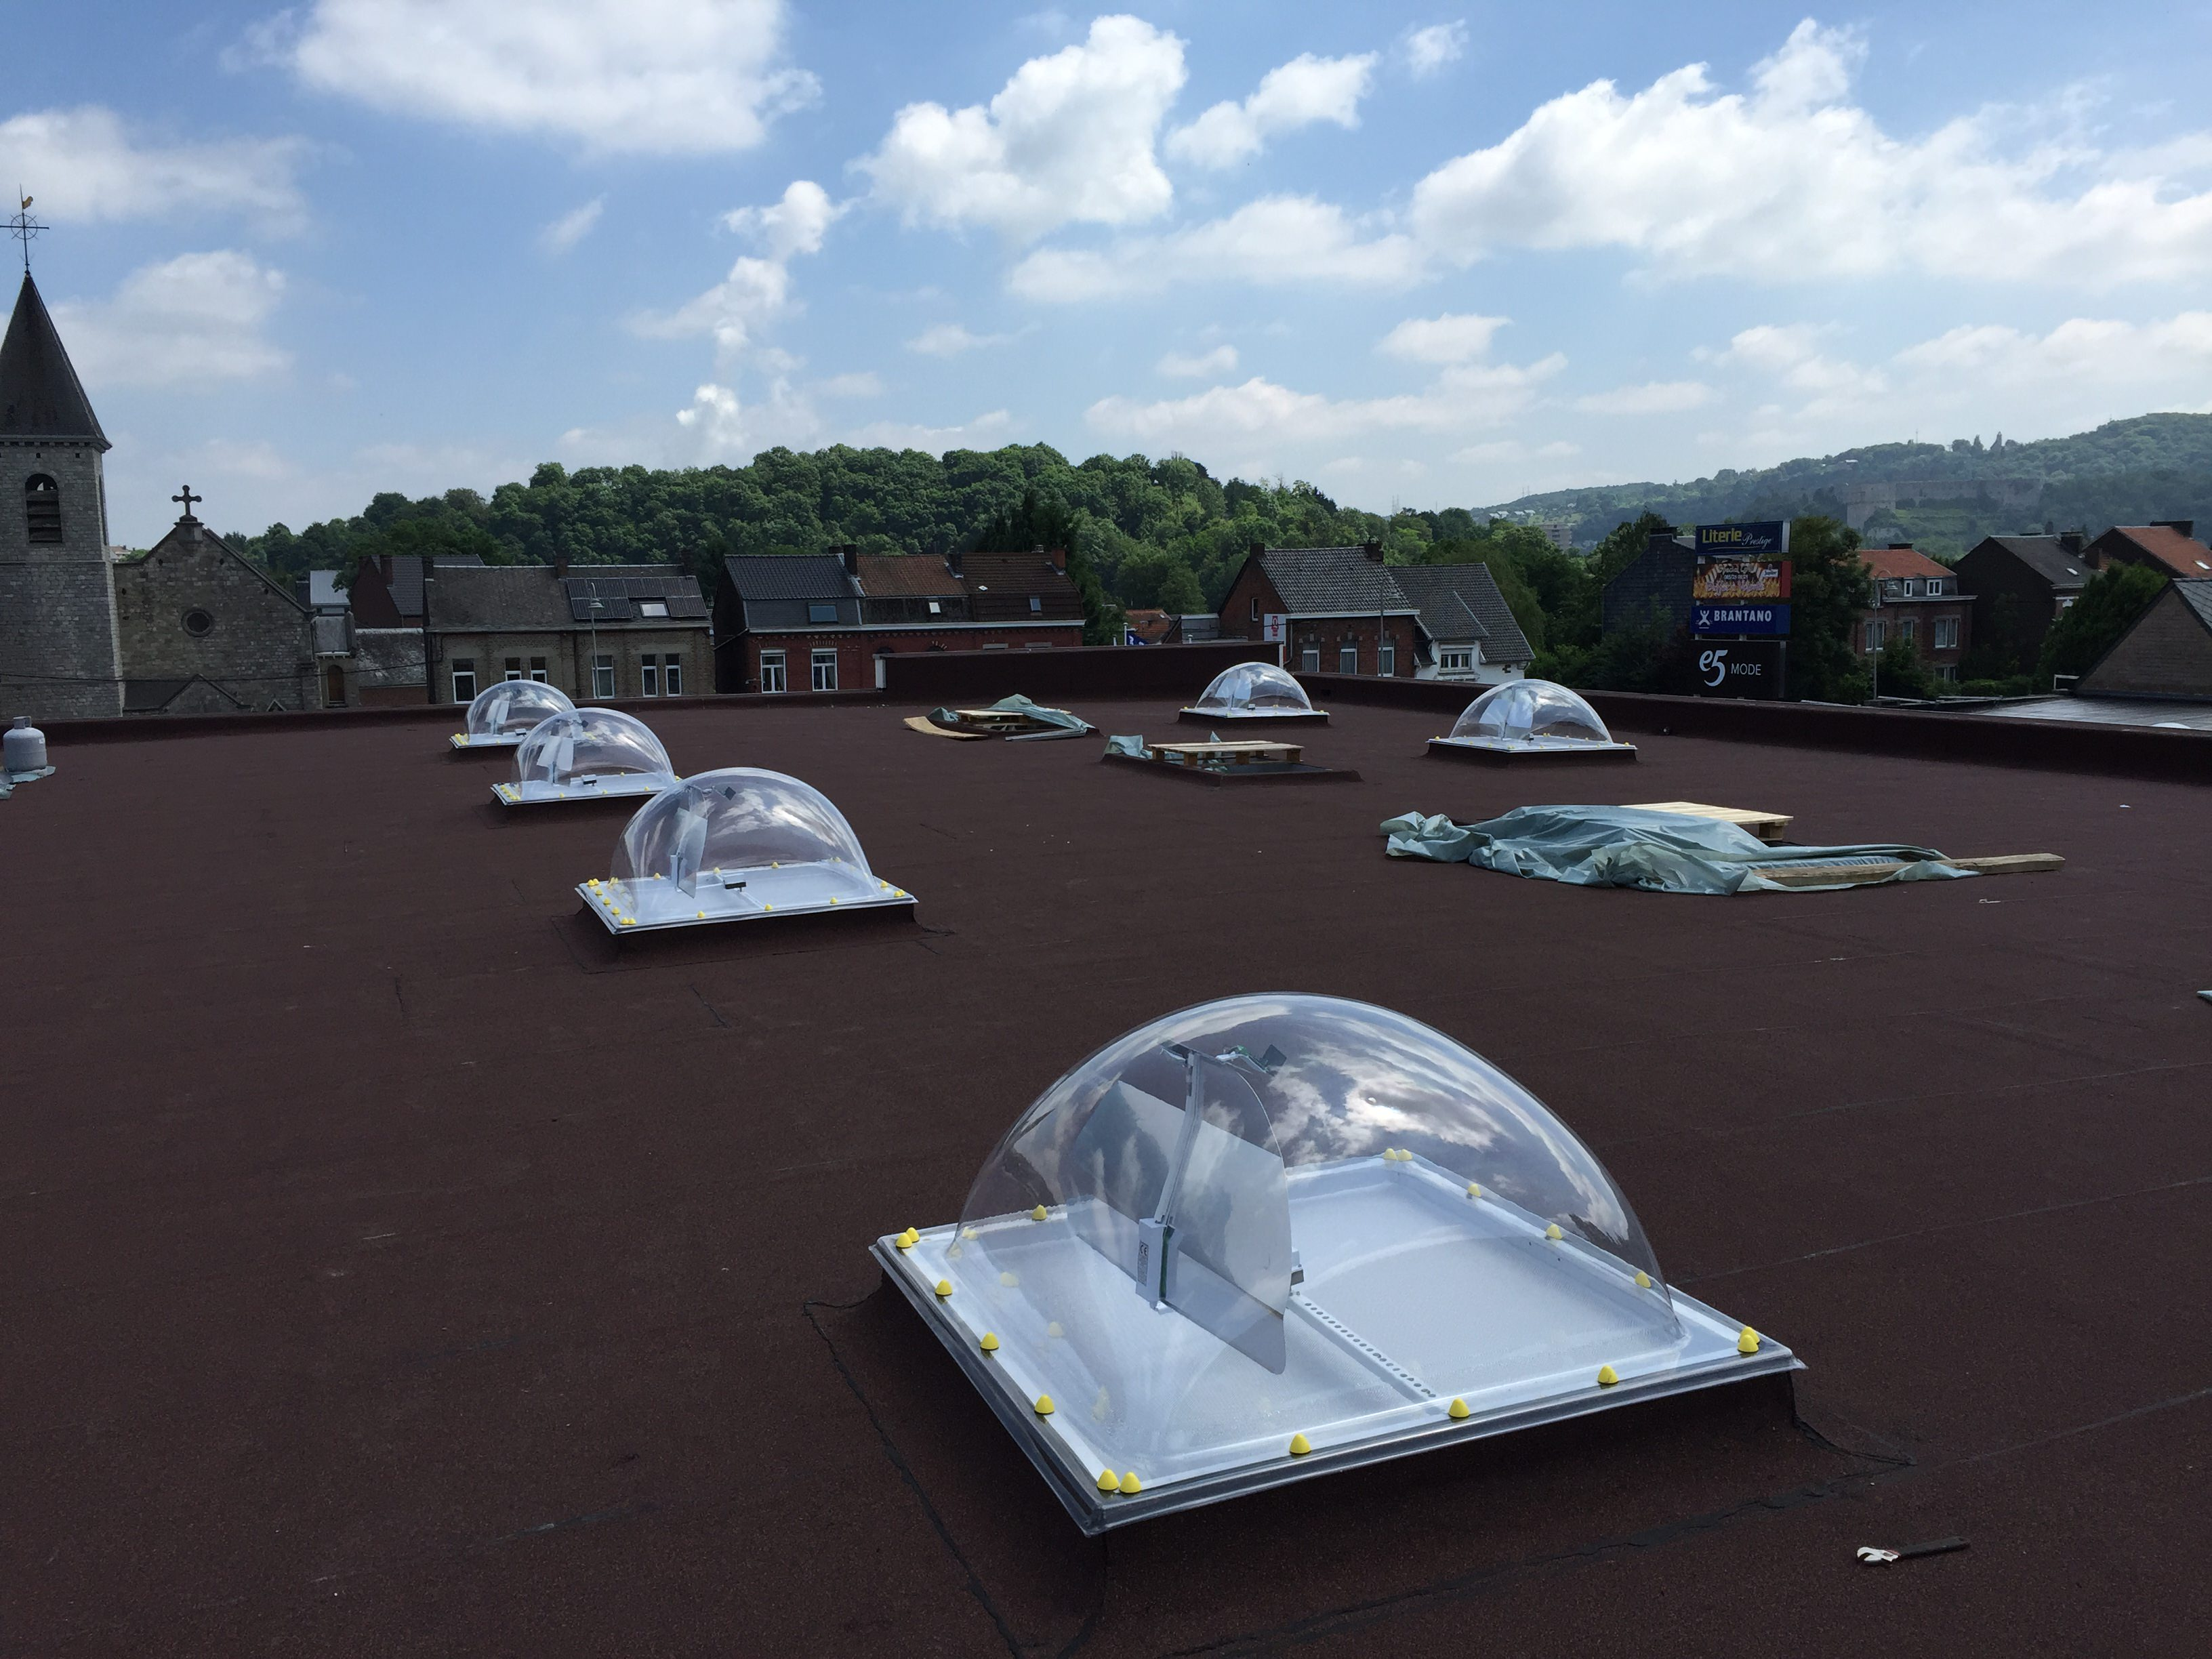 skylight-dome-bio-planet-huy-01